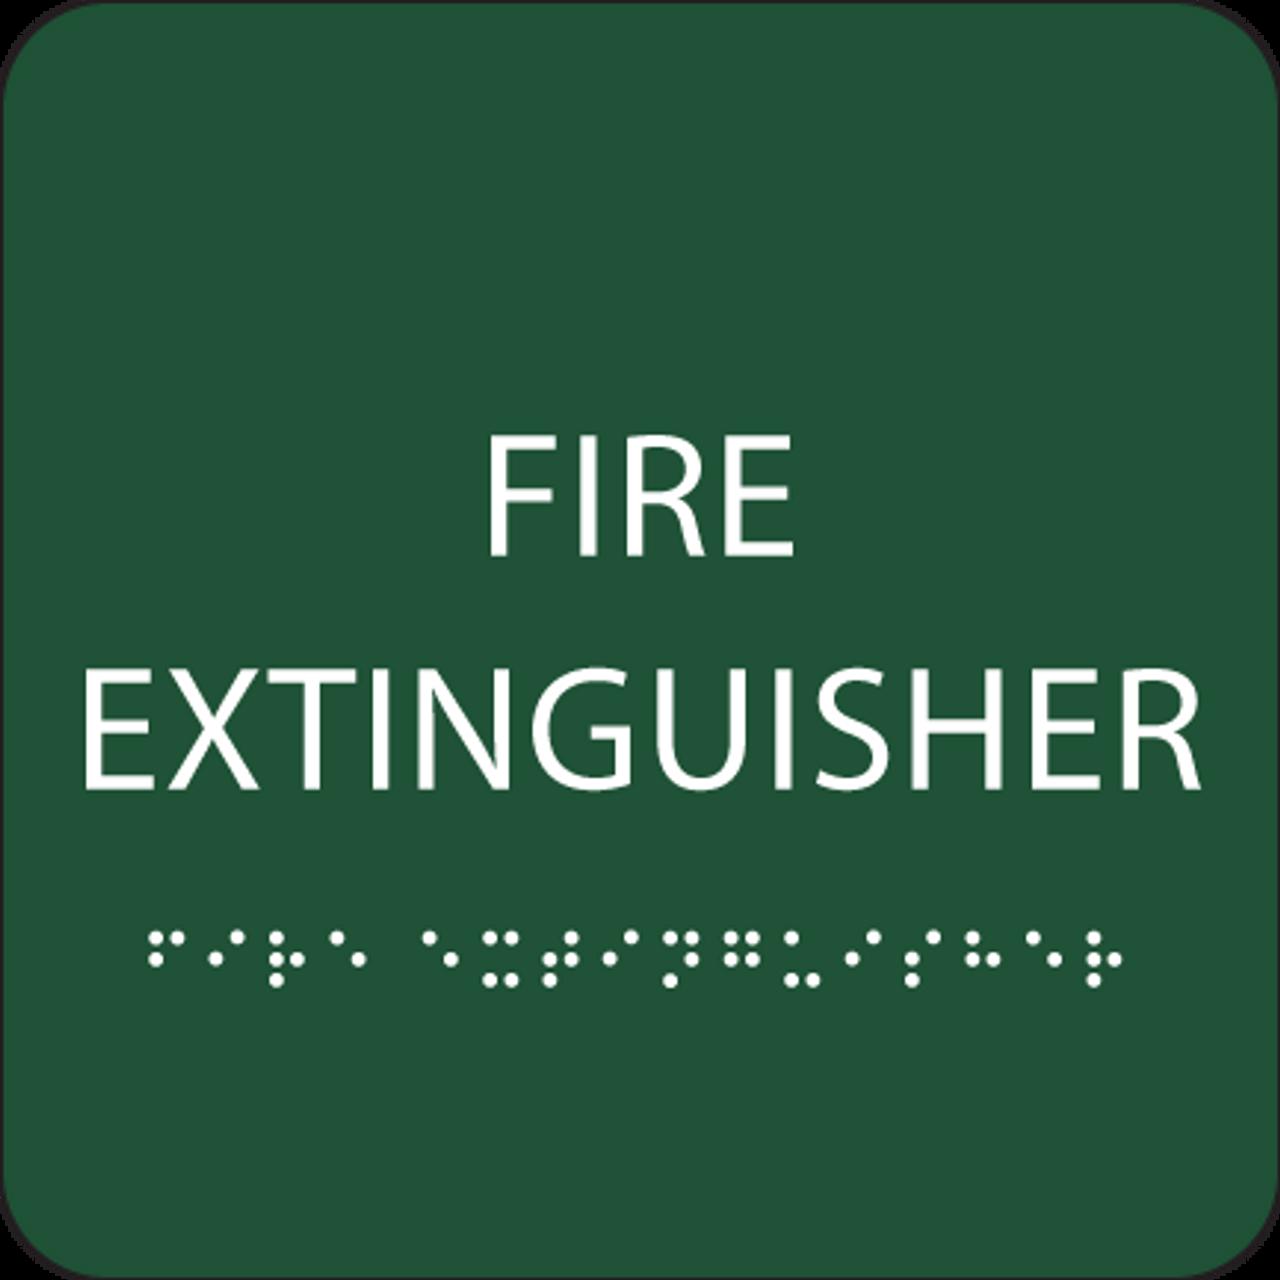 Green Fire Extinguisher ADA Sign